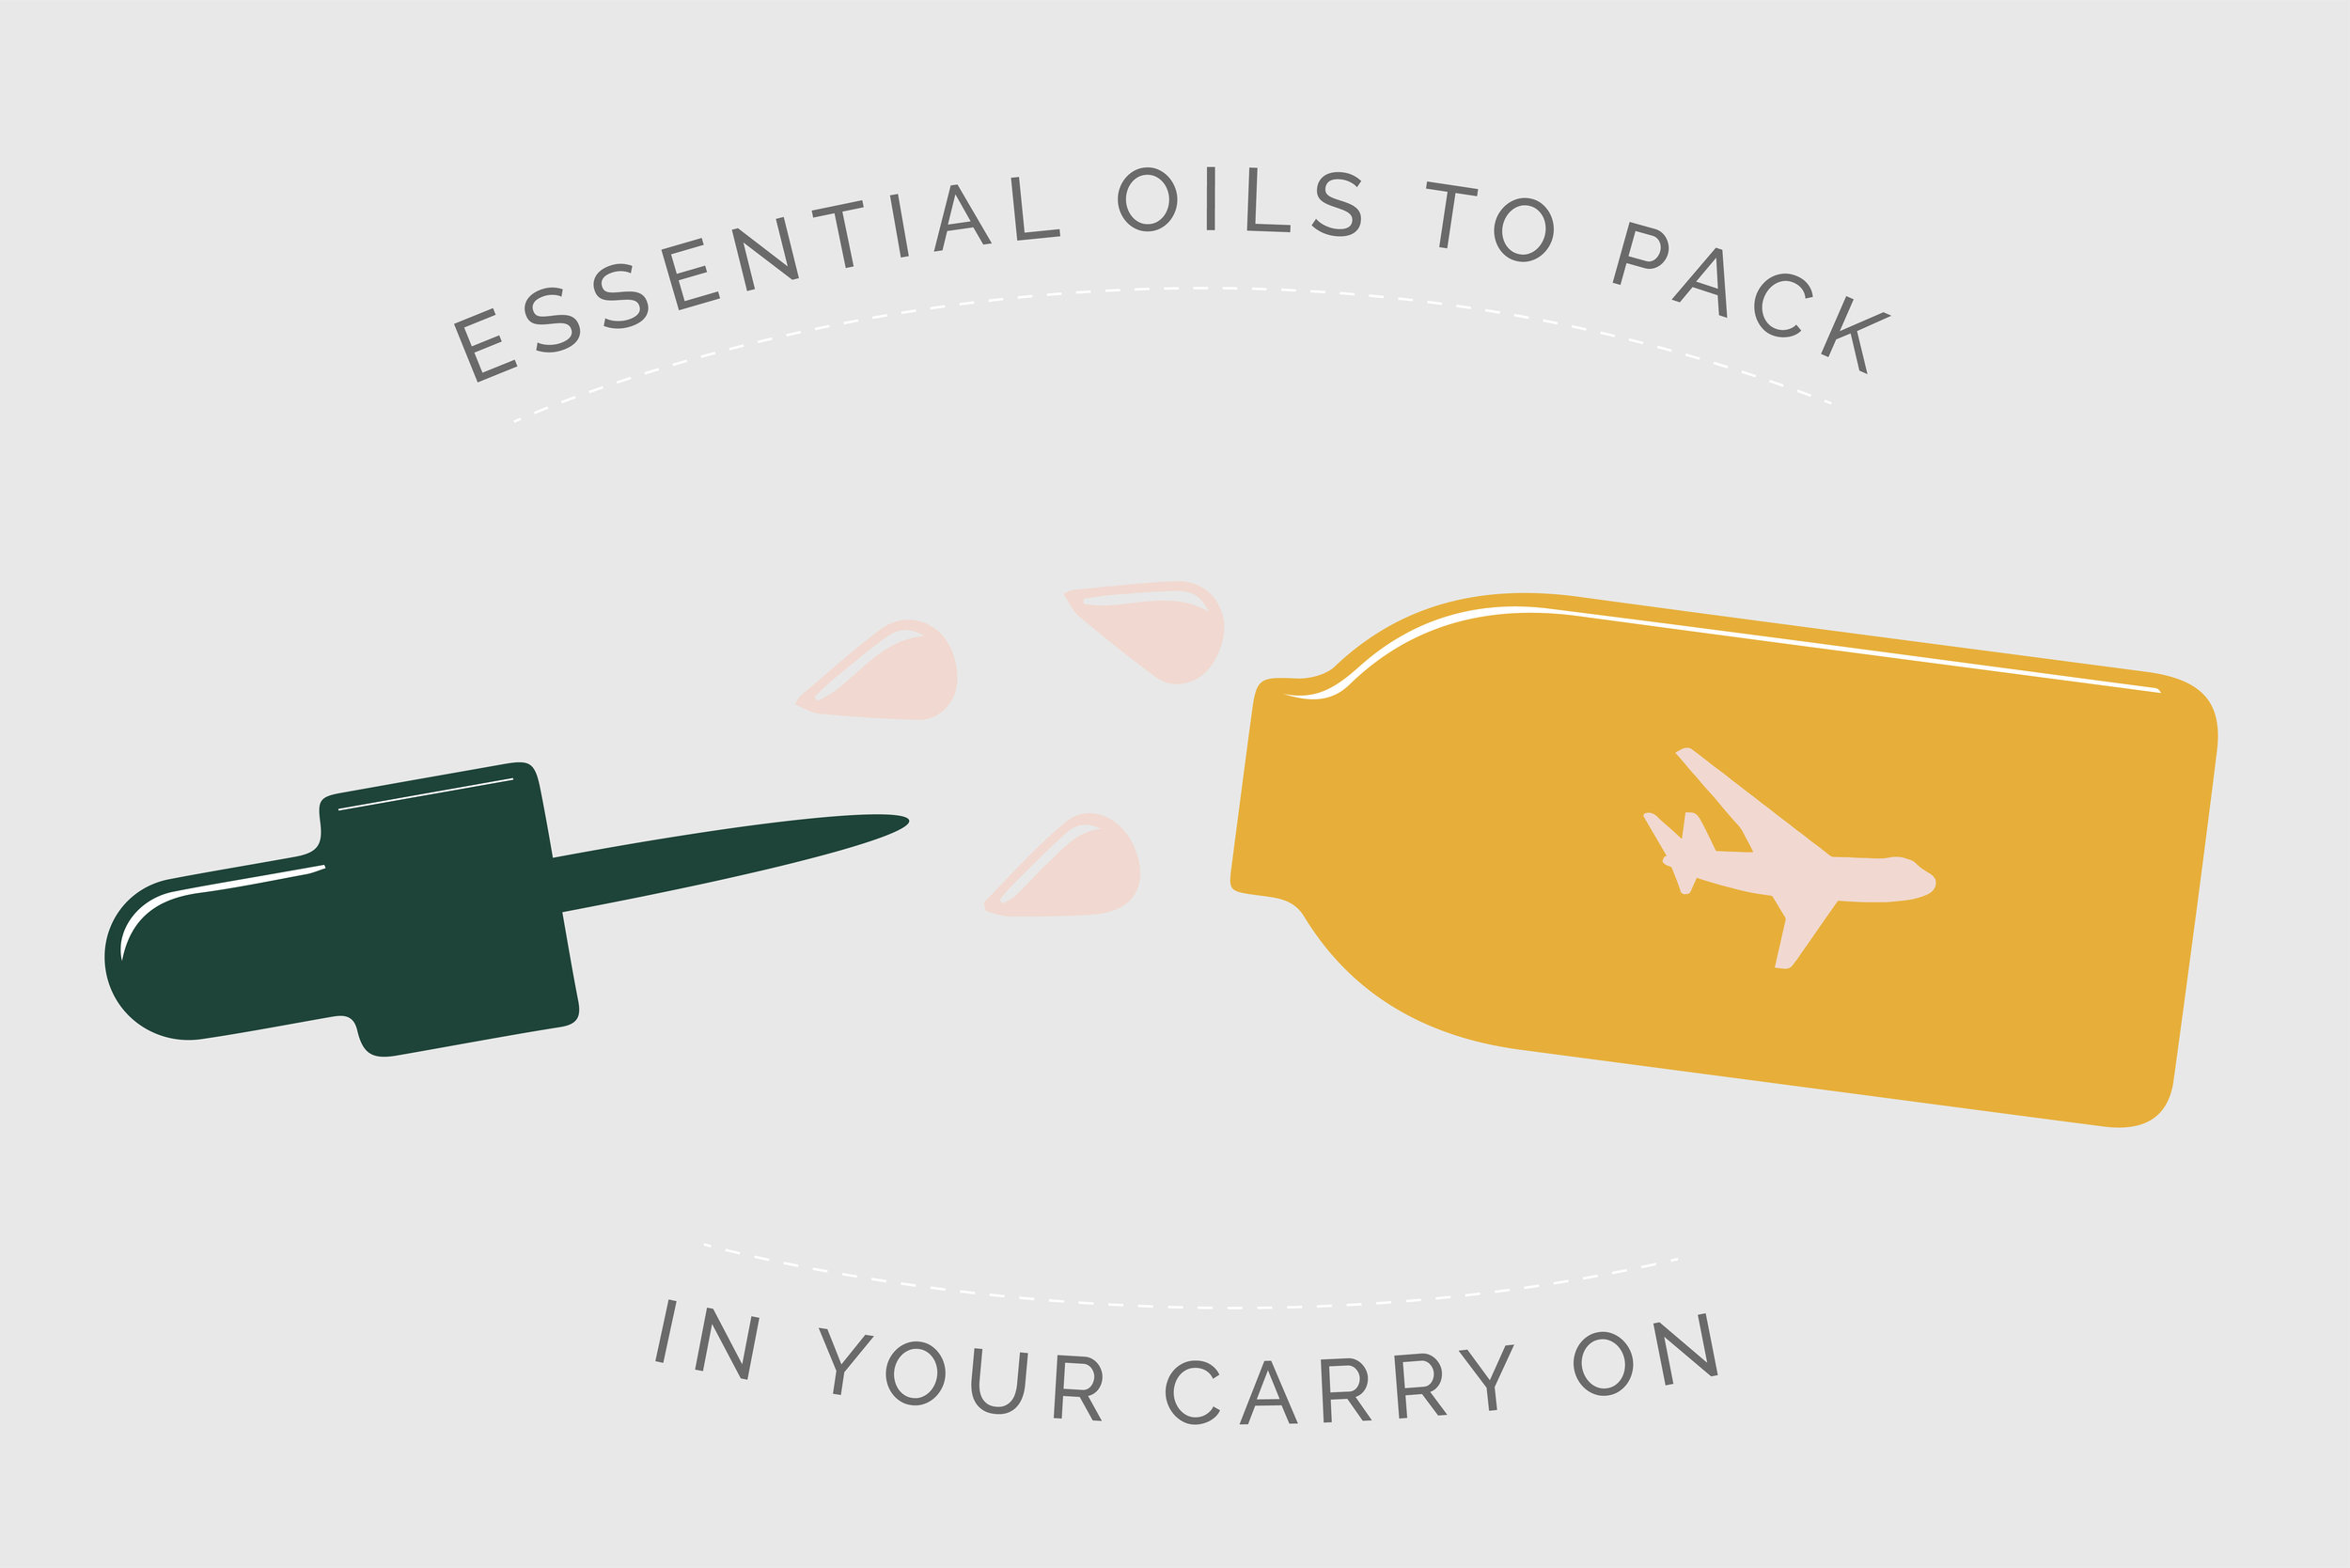 How-Essential-Oils-are-made-01-1020x560-02.jpg